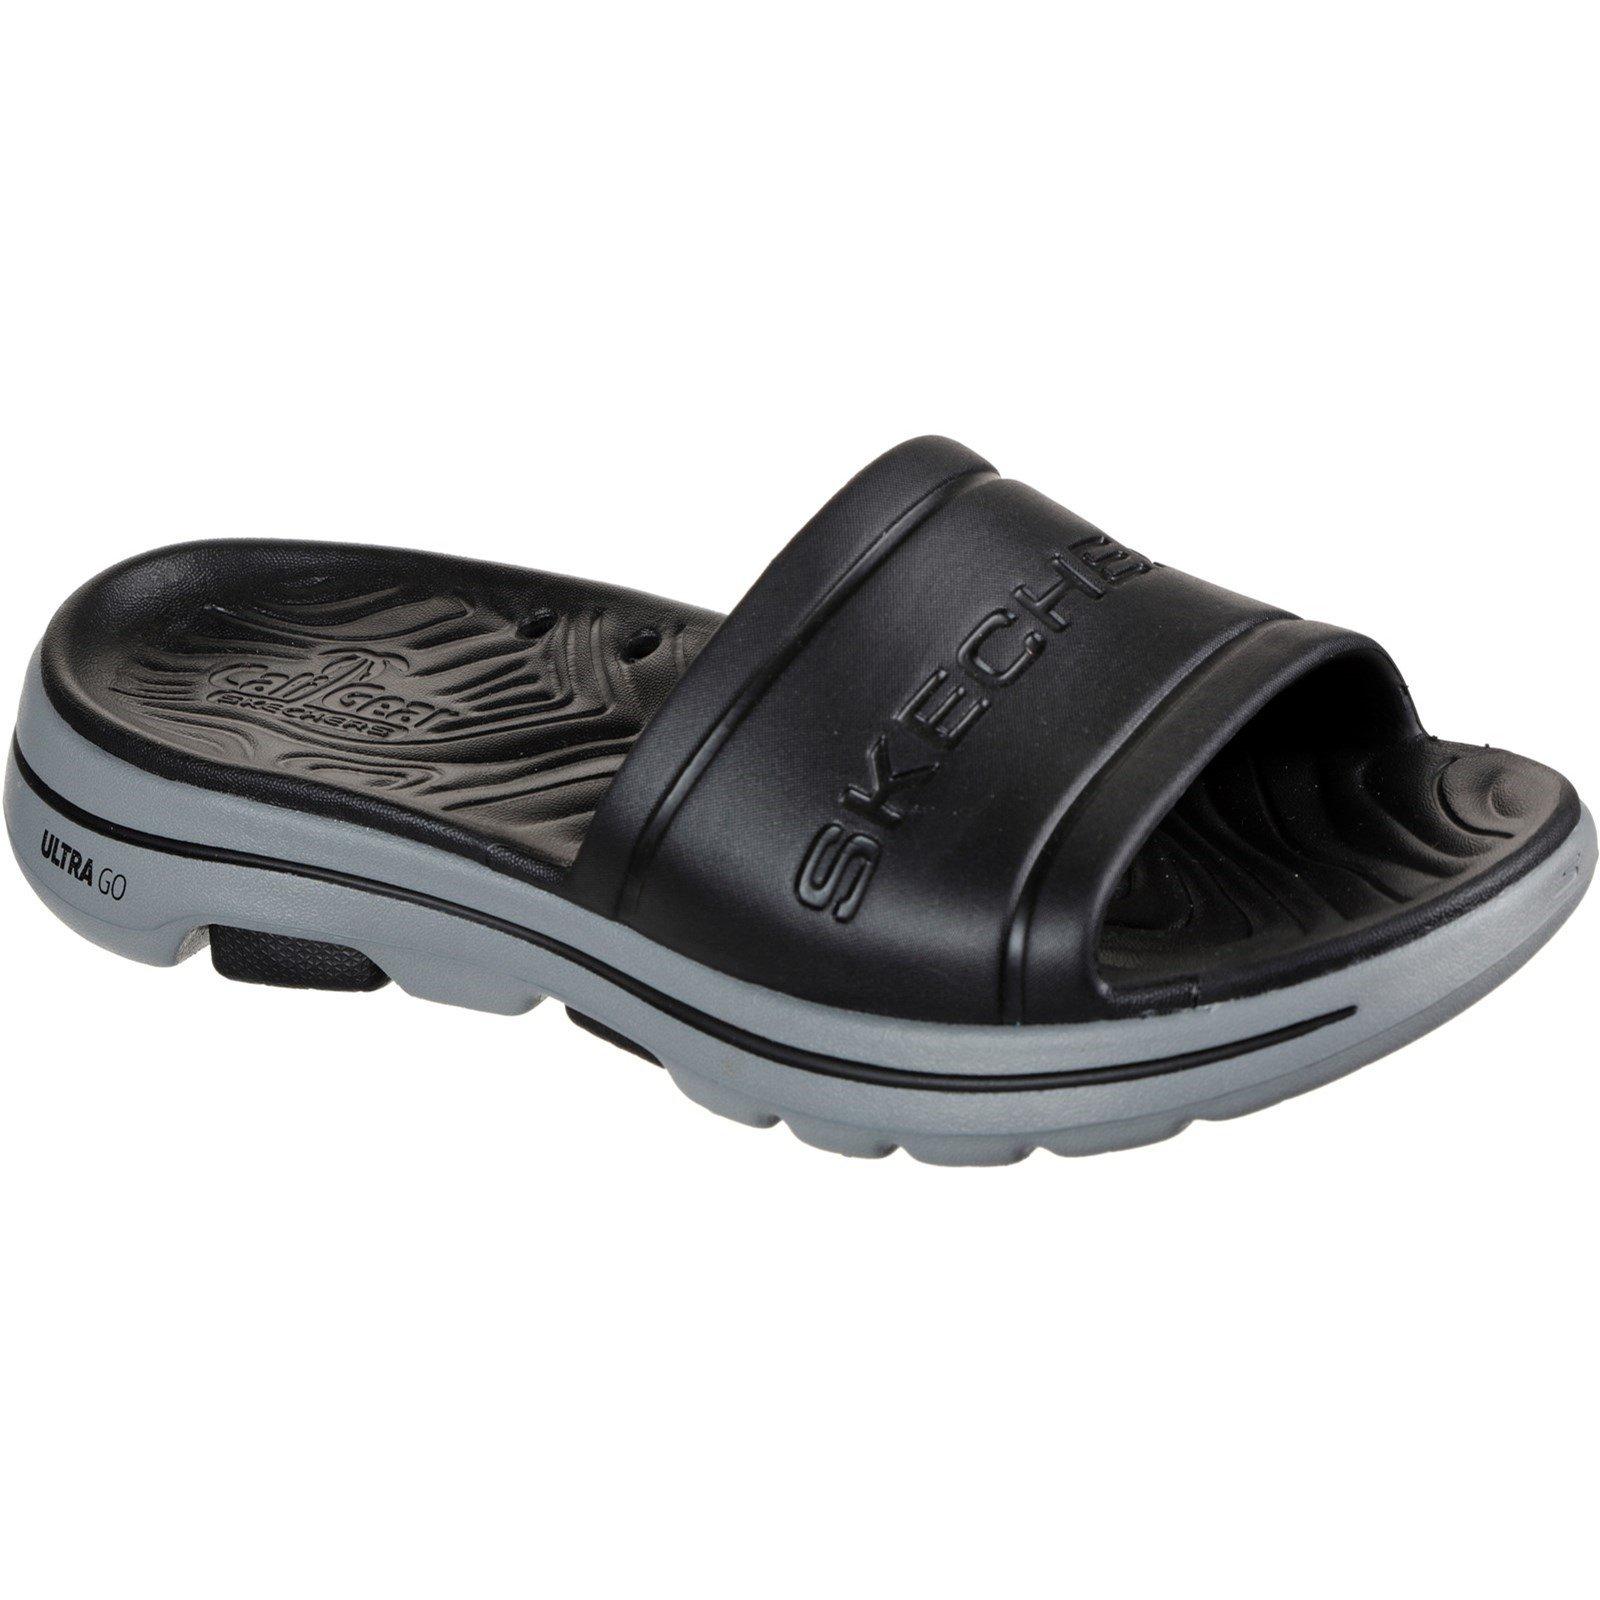 Skechers Men's Go Walk 5 Surfs Out Summer Sandal Various Colours 32207 - Black/Grey 10